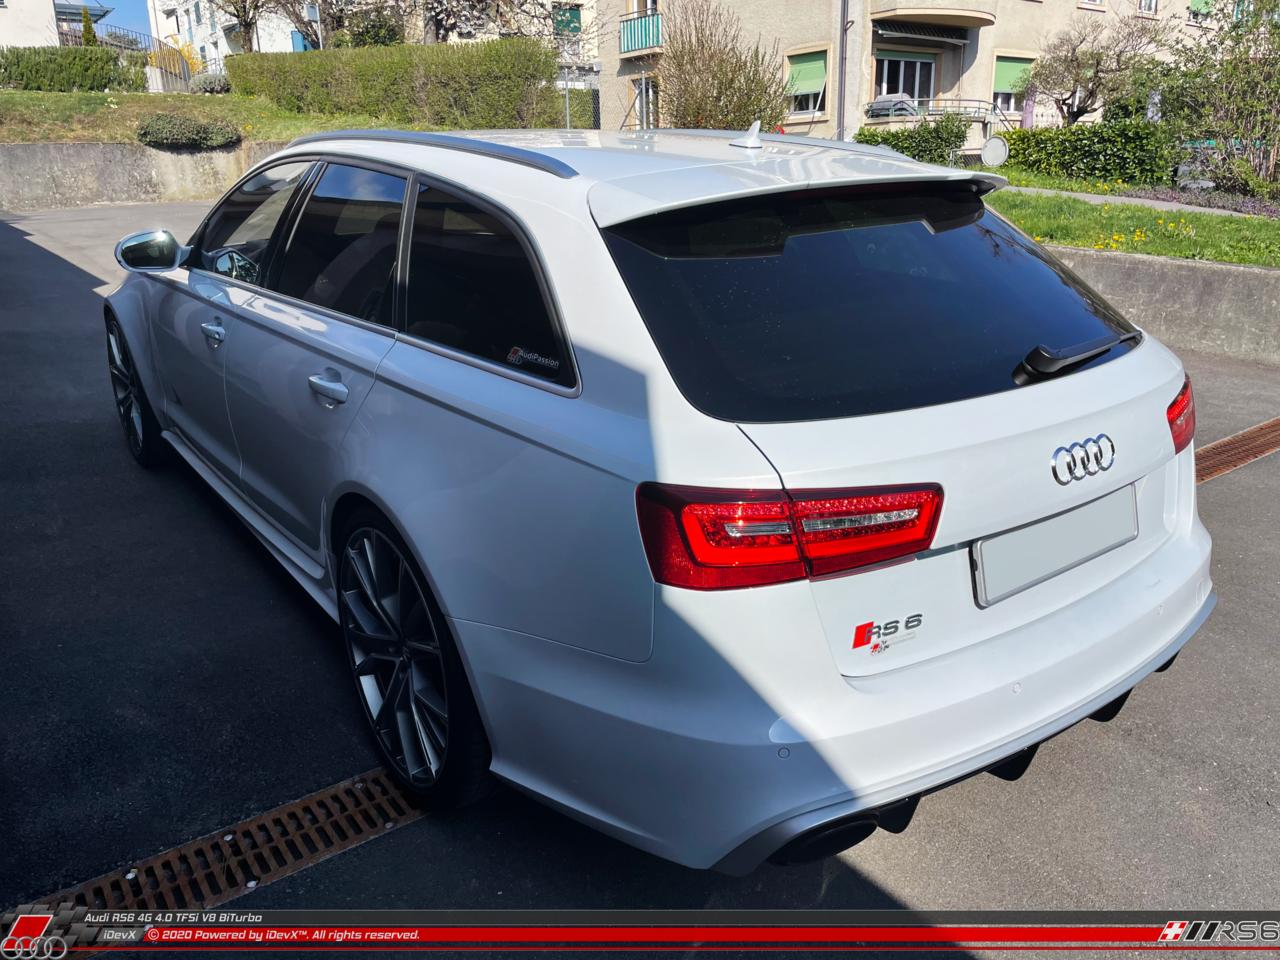 03.04.2021_Audi-RS6_iDevX_004.png